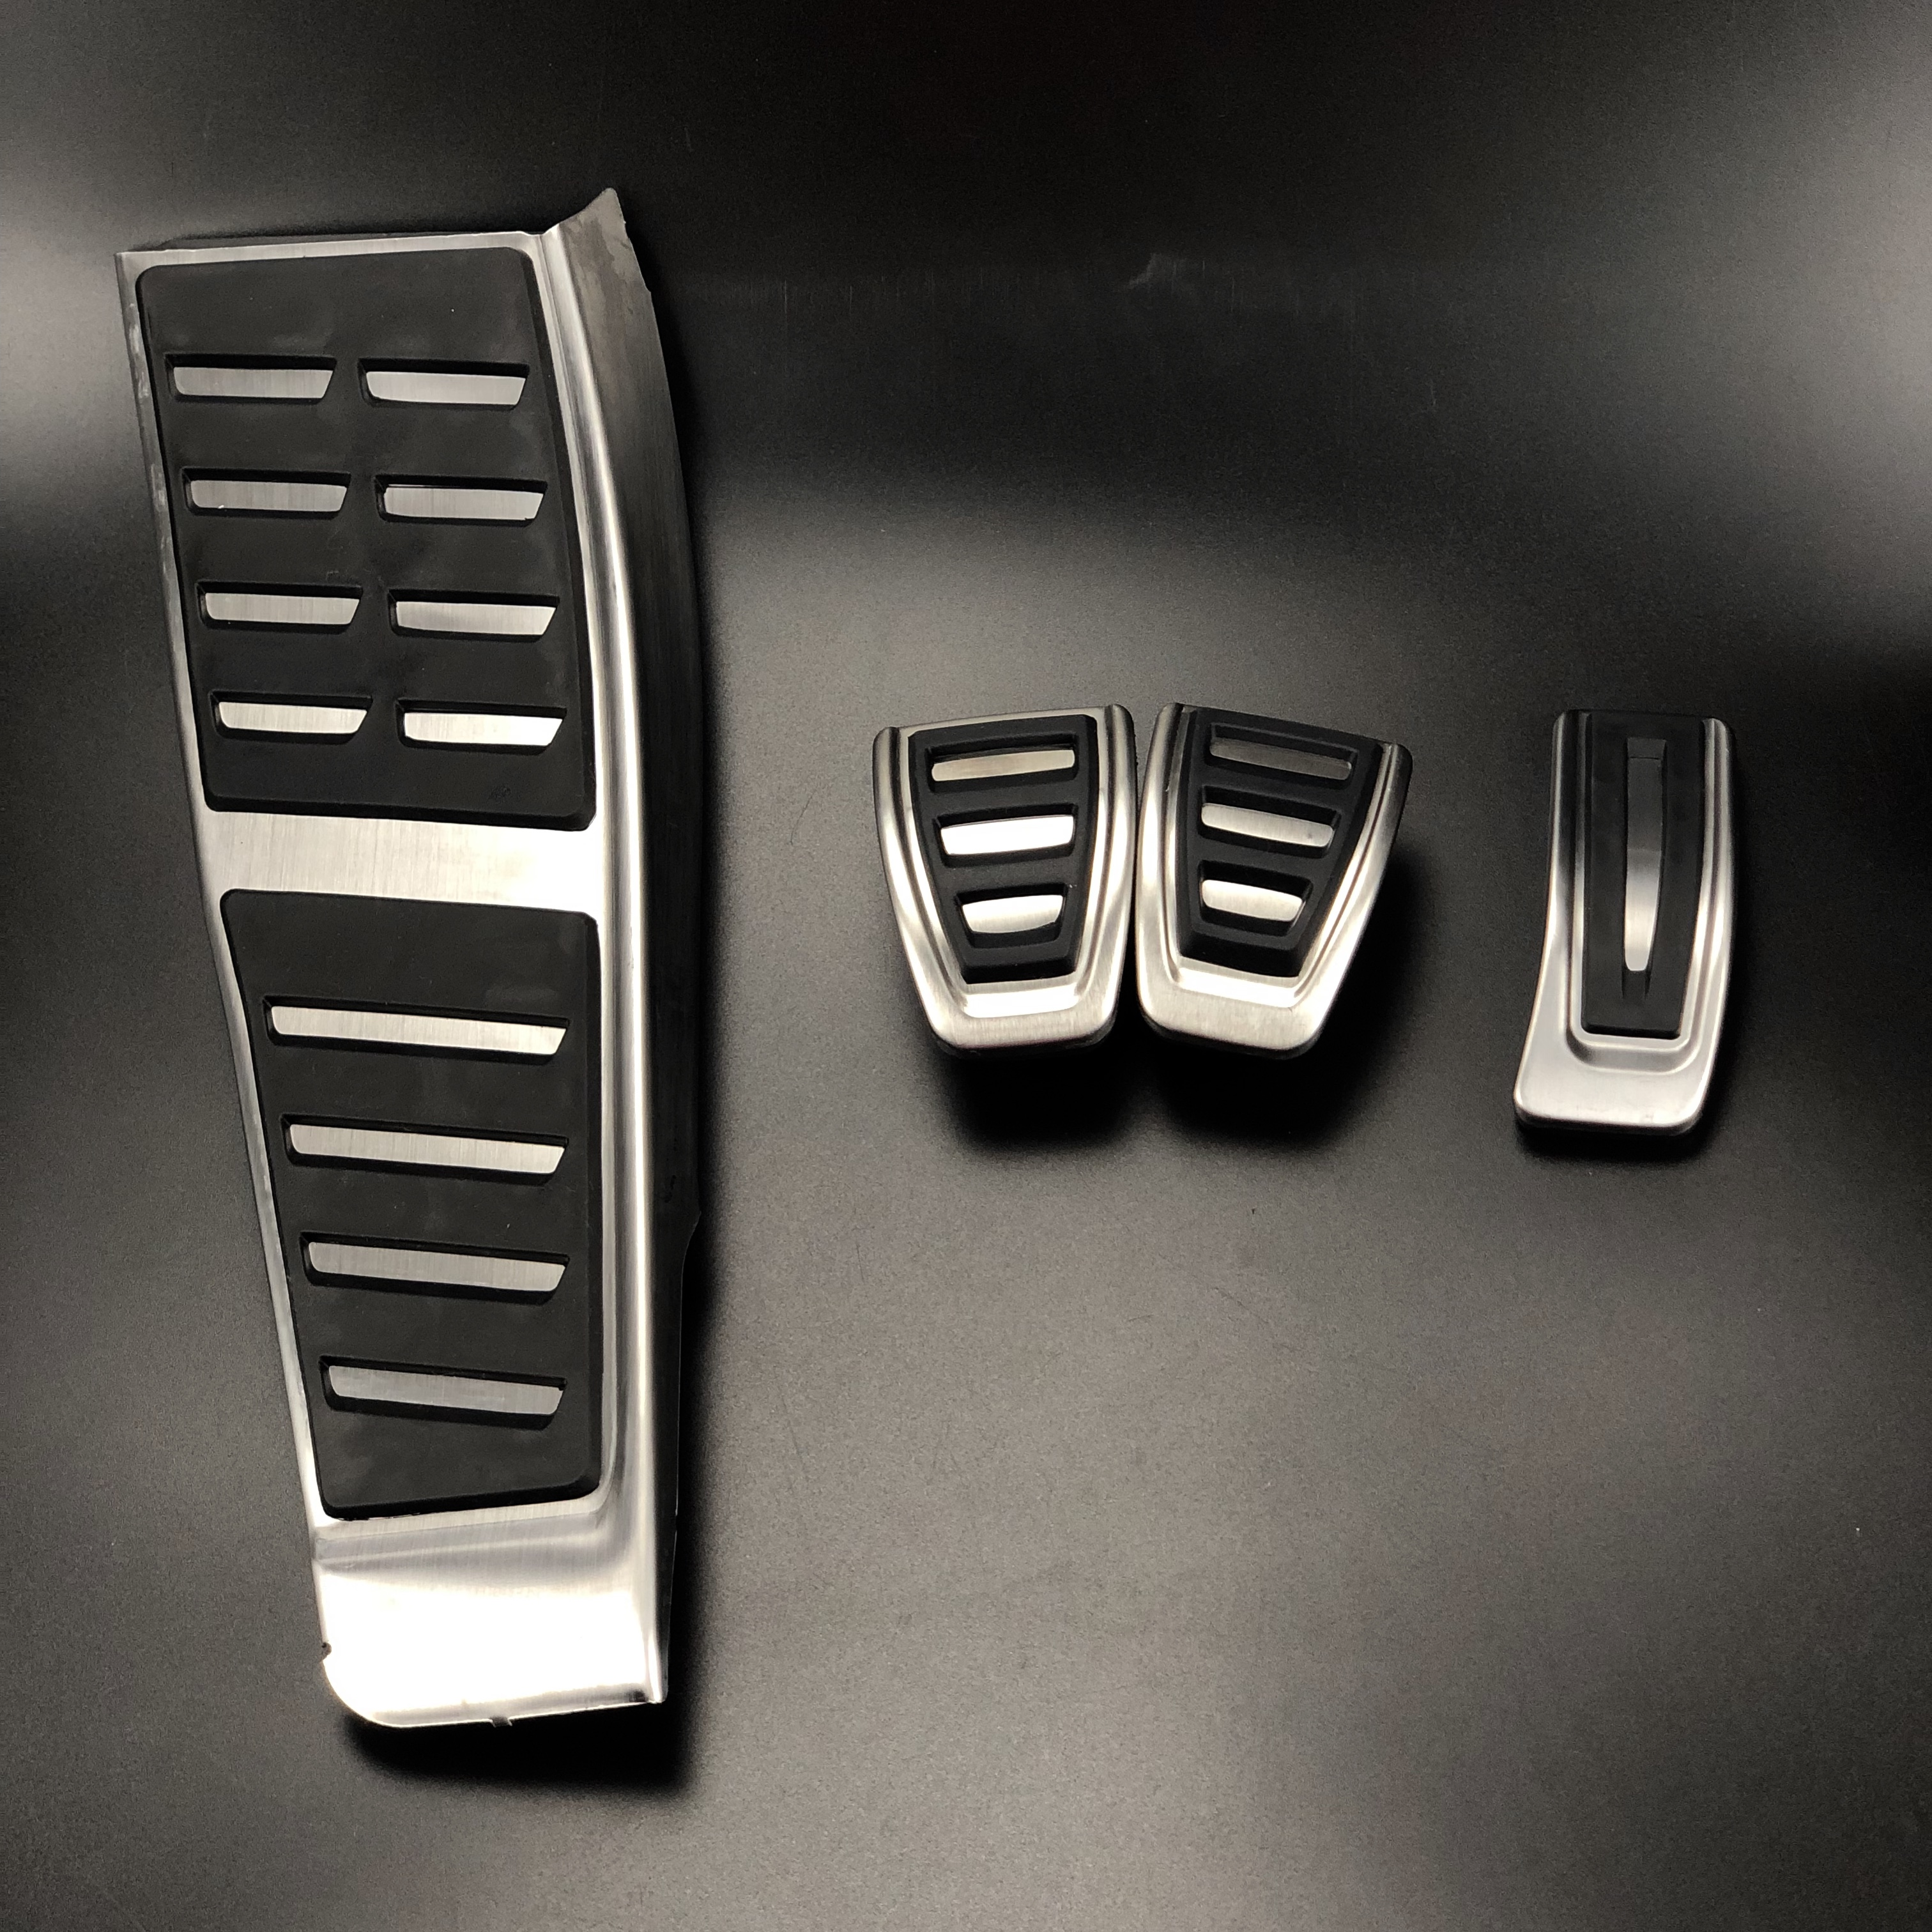 Cubierta de reposapiés para frenos de combustible de Gas RHD, embellecedor de almohadilla AT & MT para Audi A5 B8 2007-2015 A4 B8 8 8K Q5 8R, Kit de tapa de Pedal